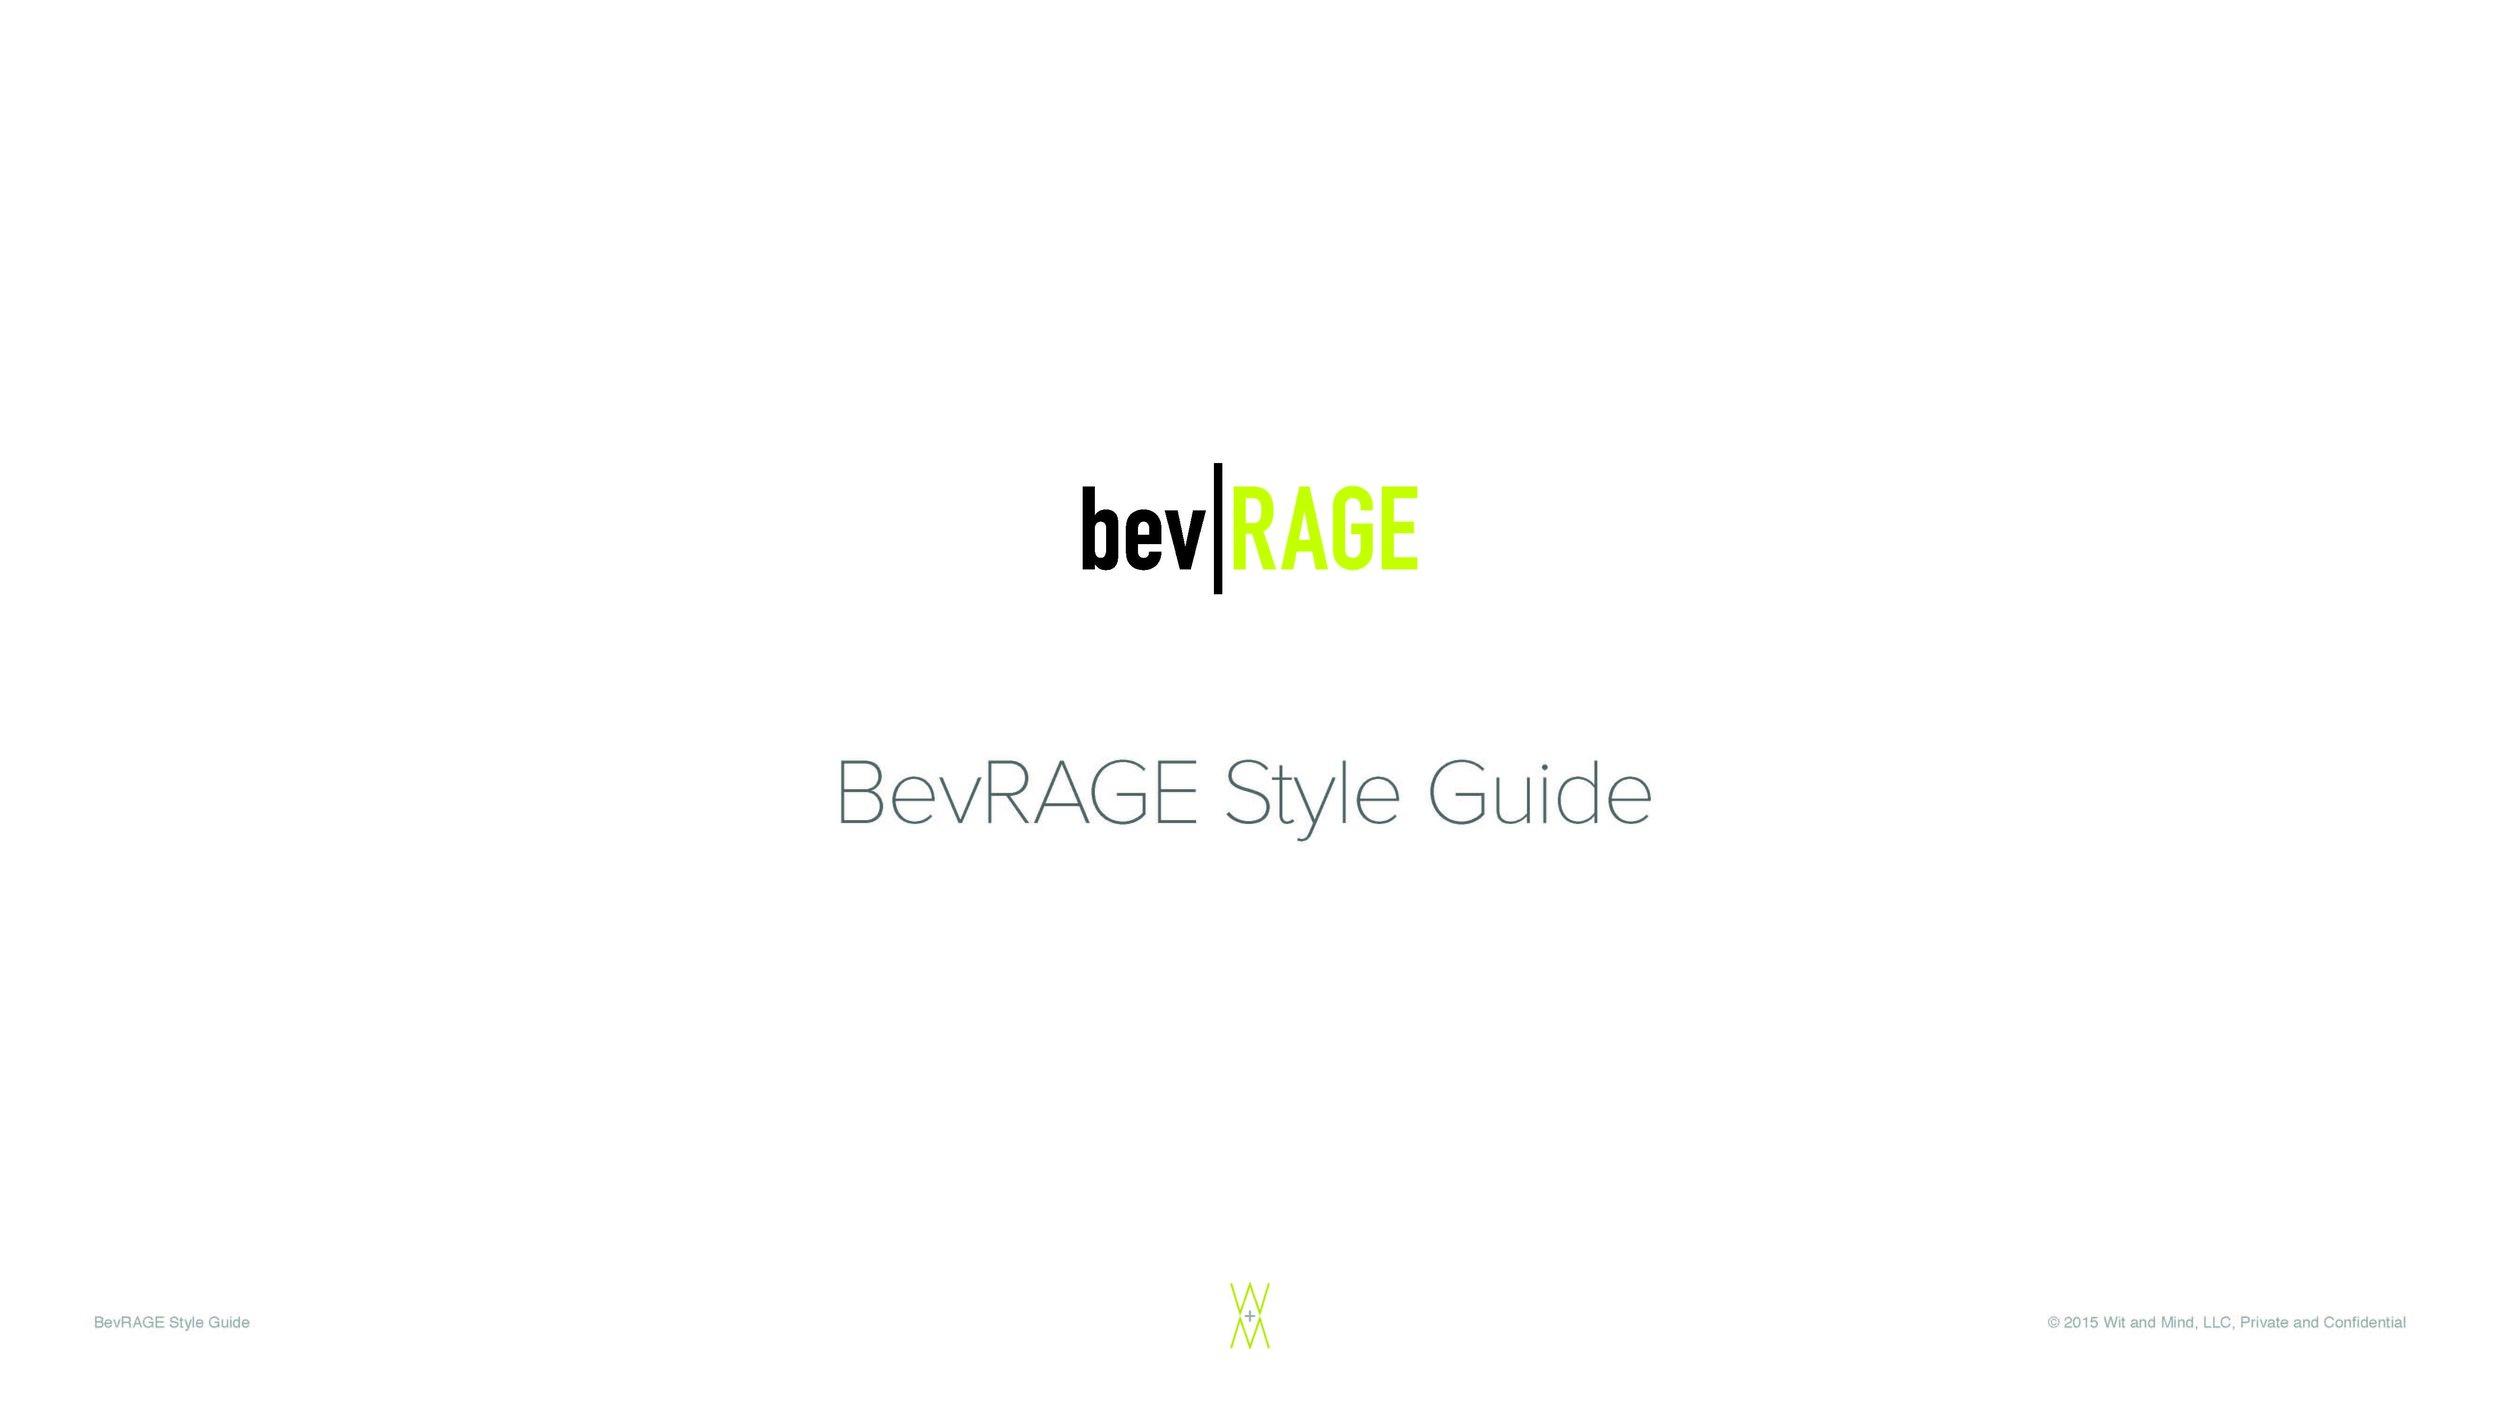 BevRAGE_Styleguide_121015_Page_01.jpg